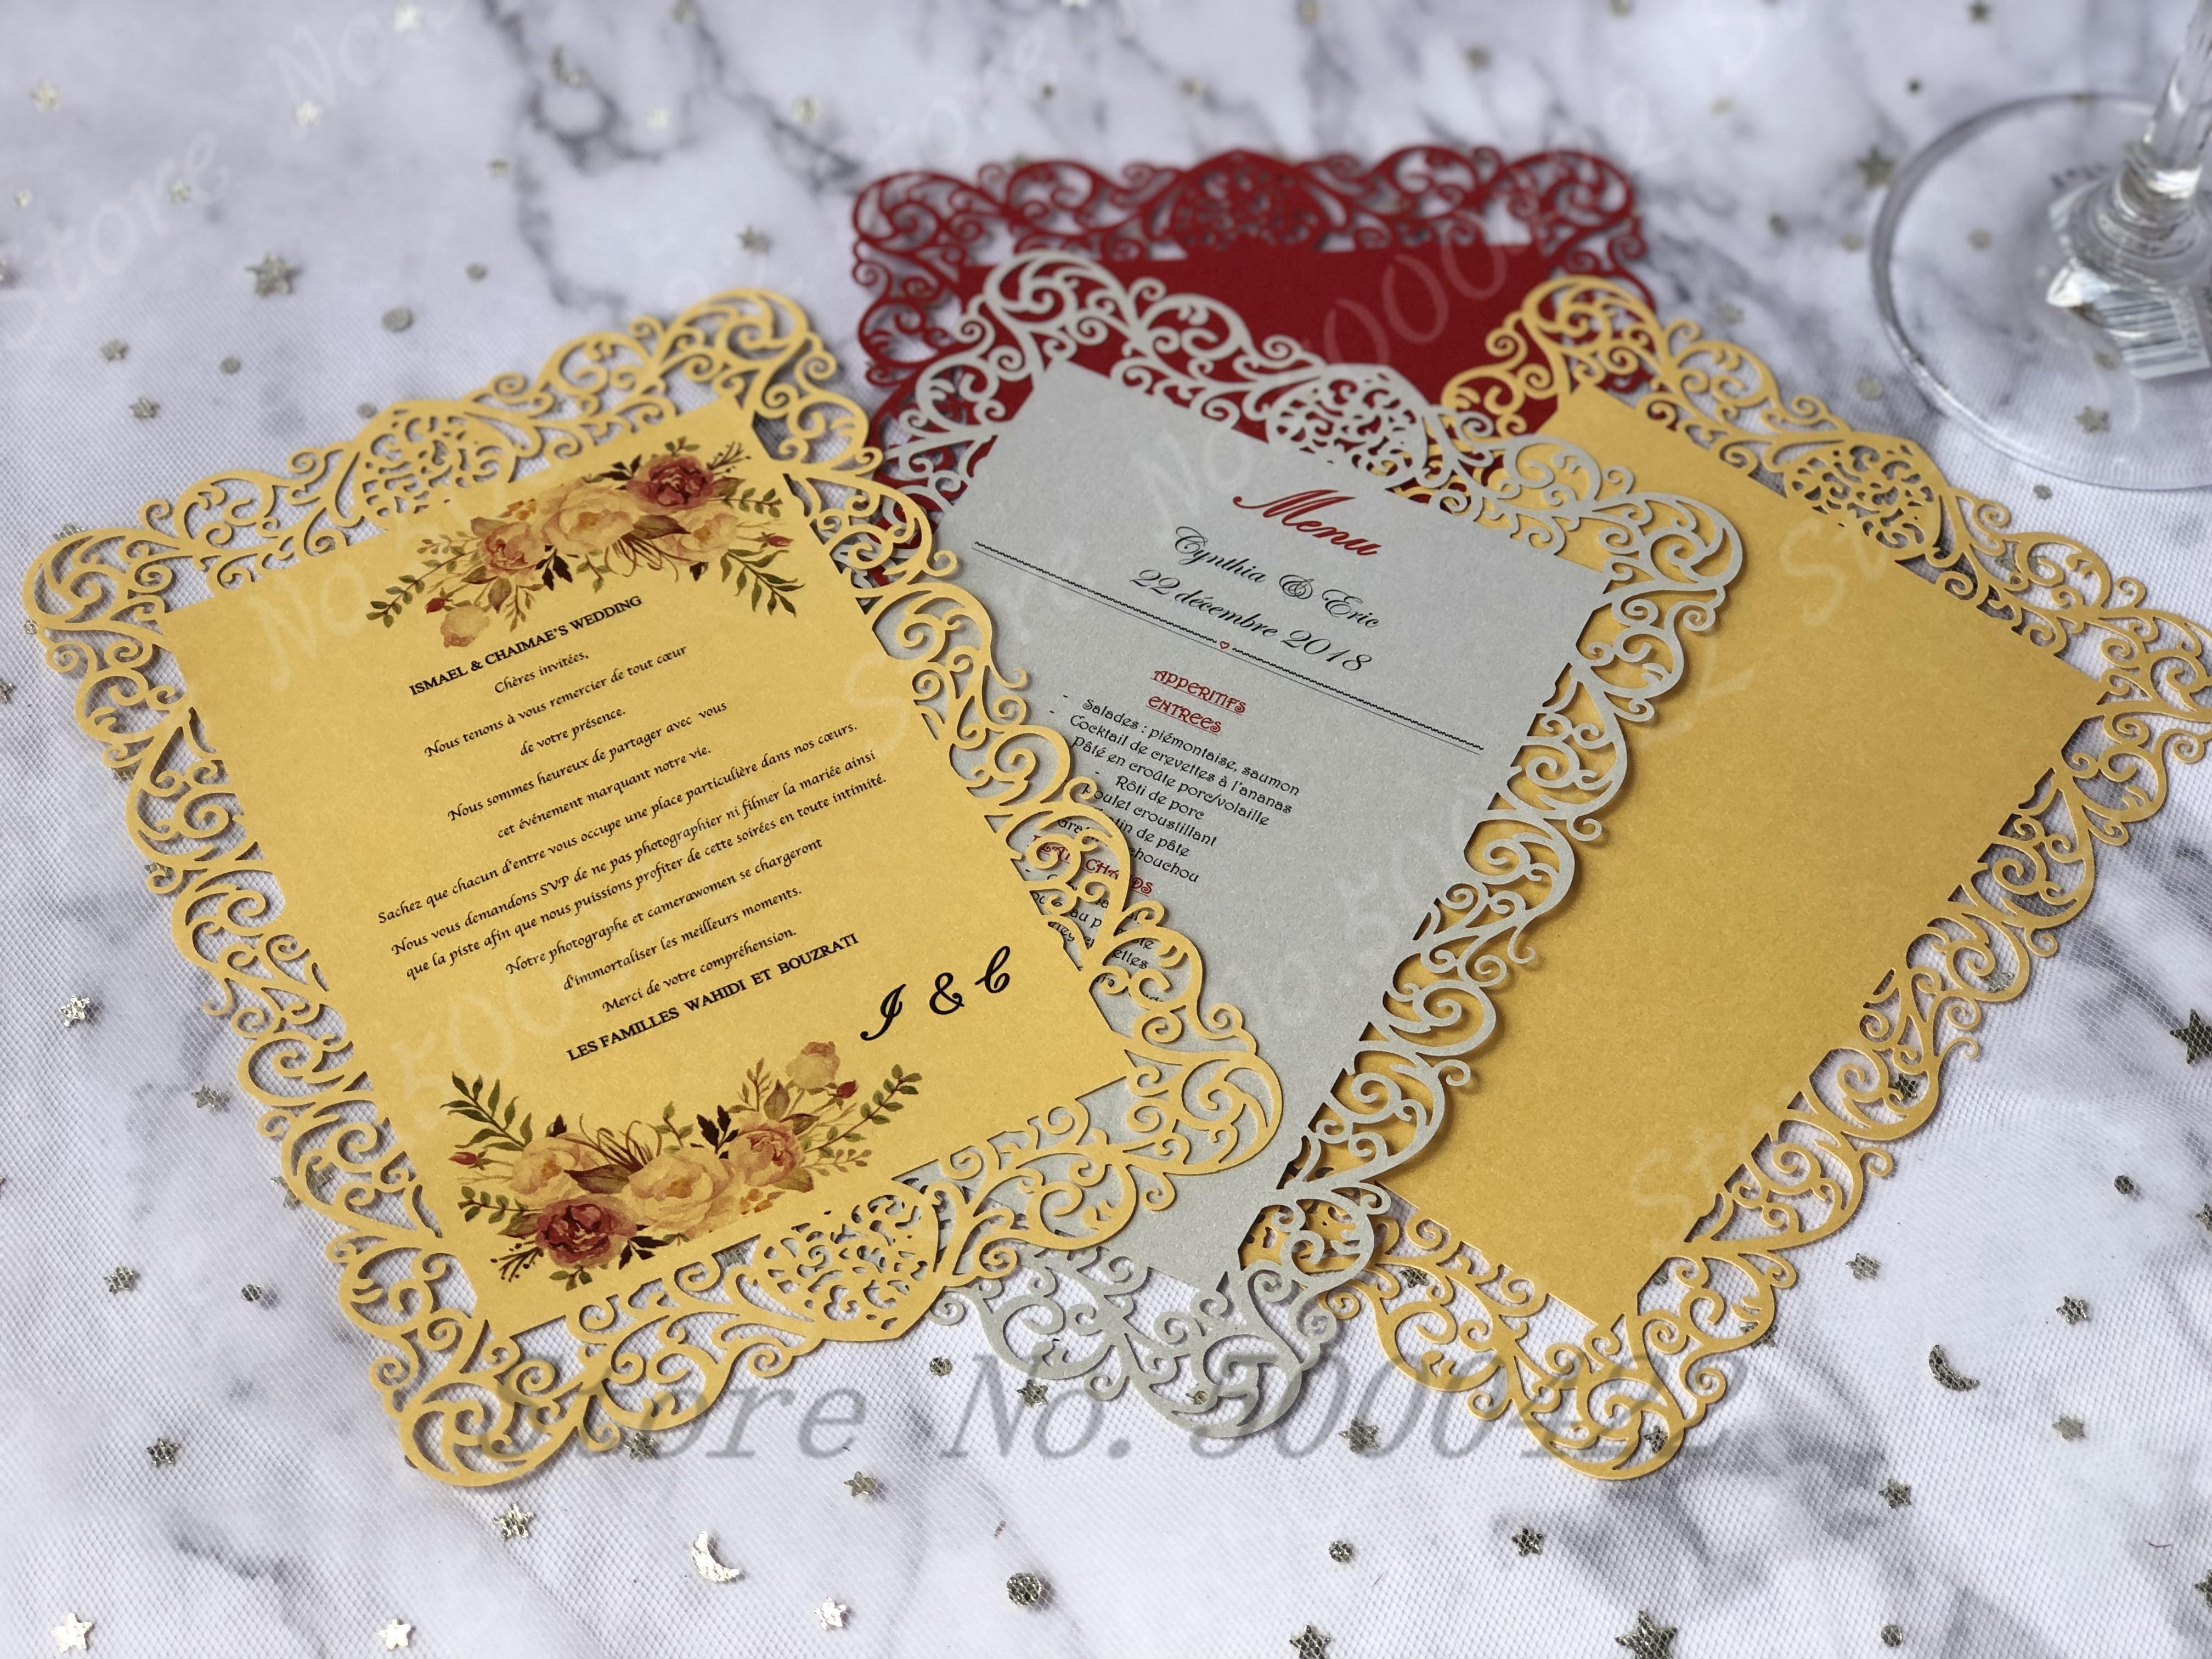 50pcs laser cutting menu card paper restaurant banquet menu card save date rsvp wedding invitation card event card